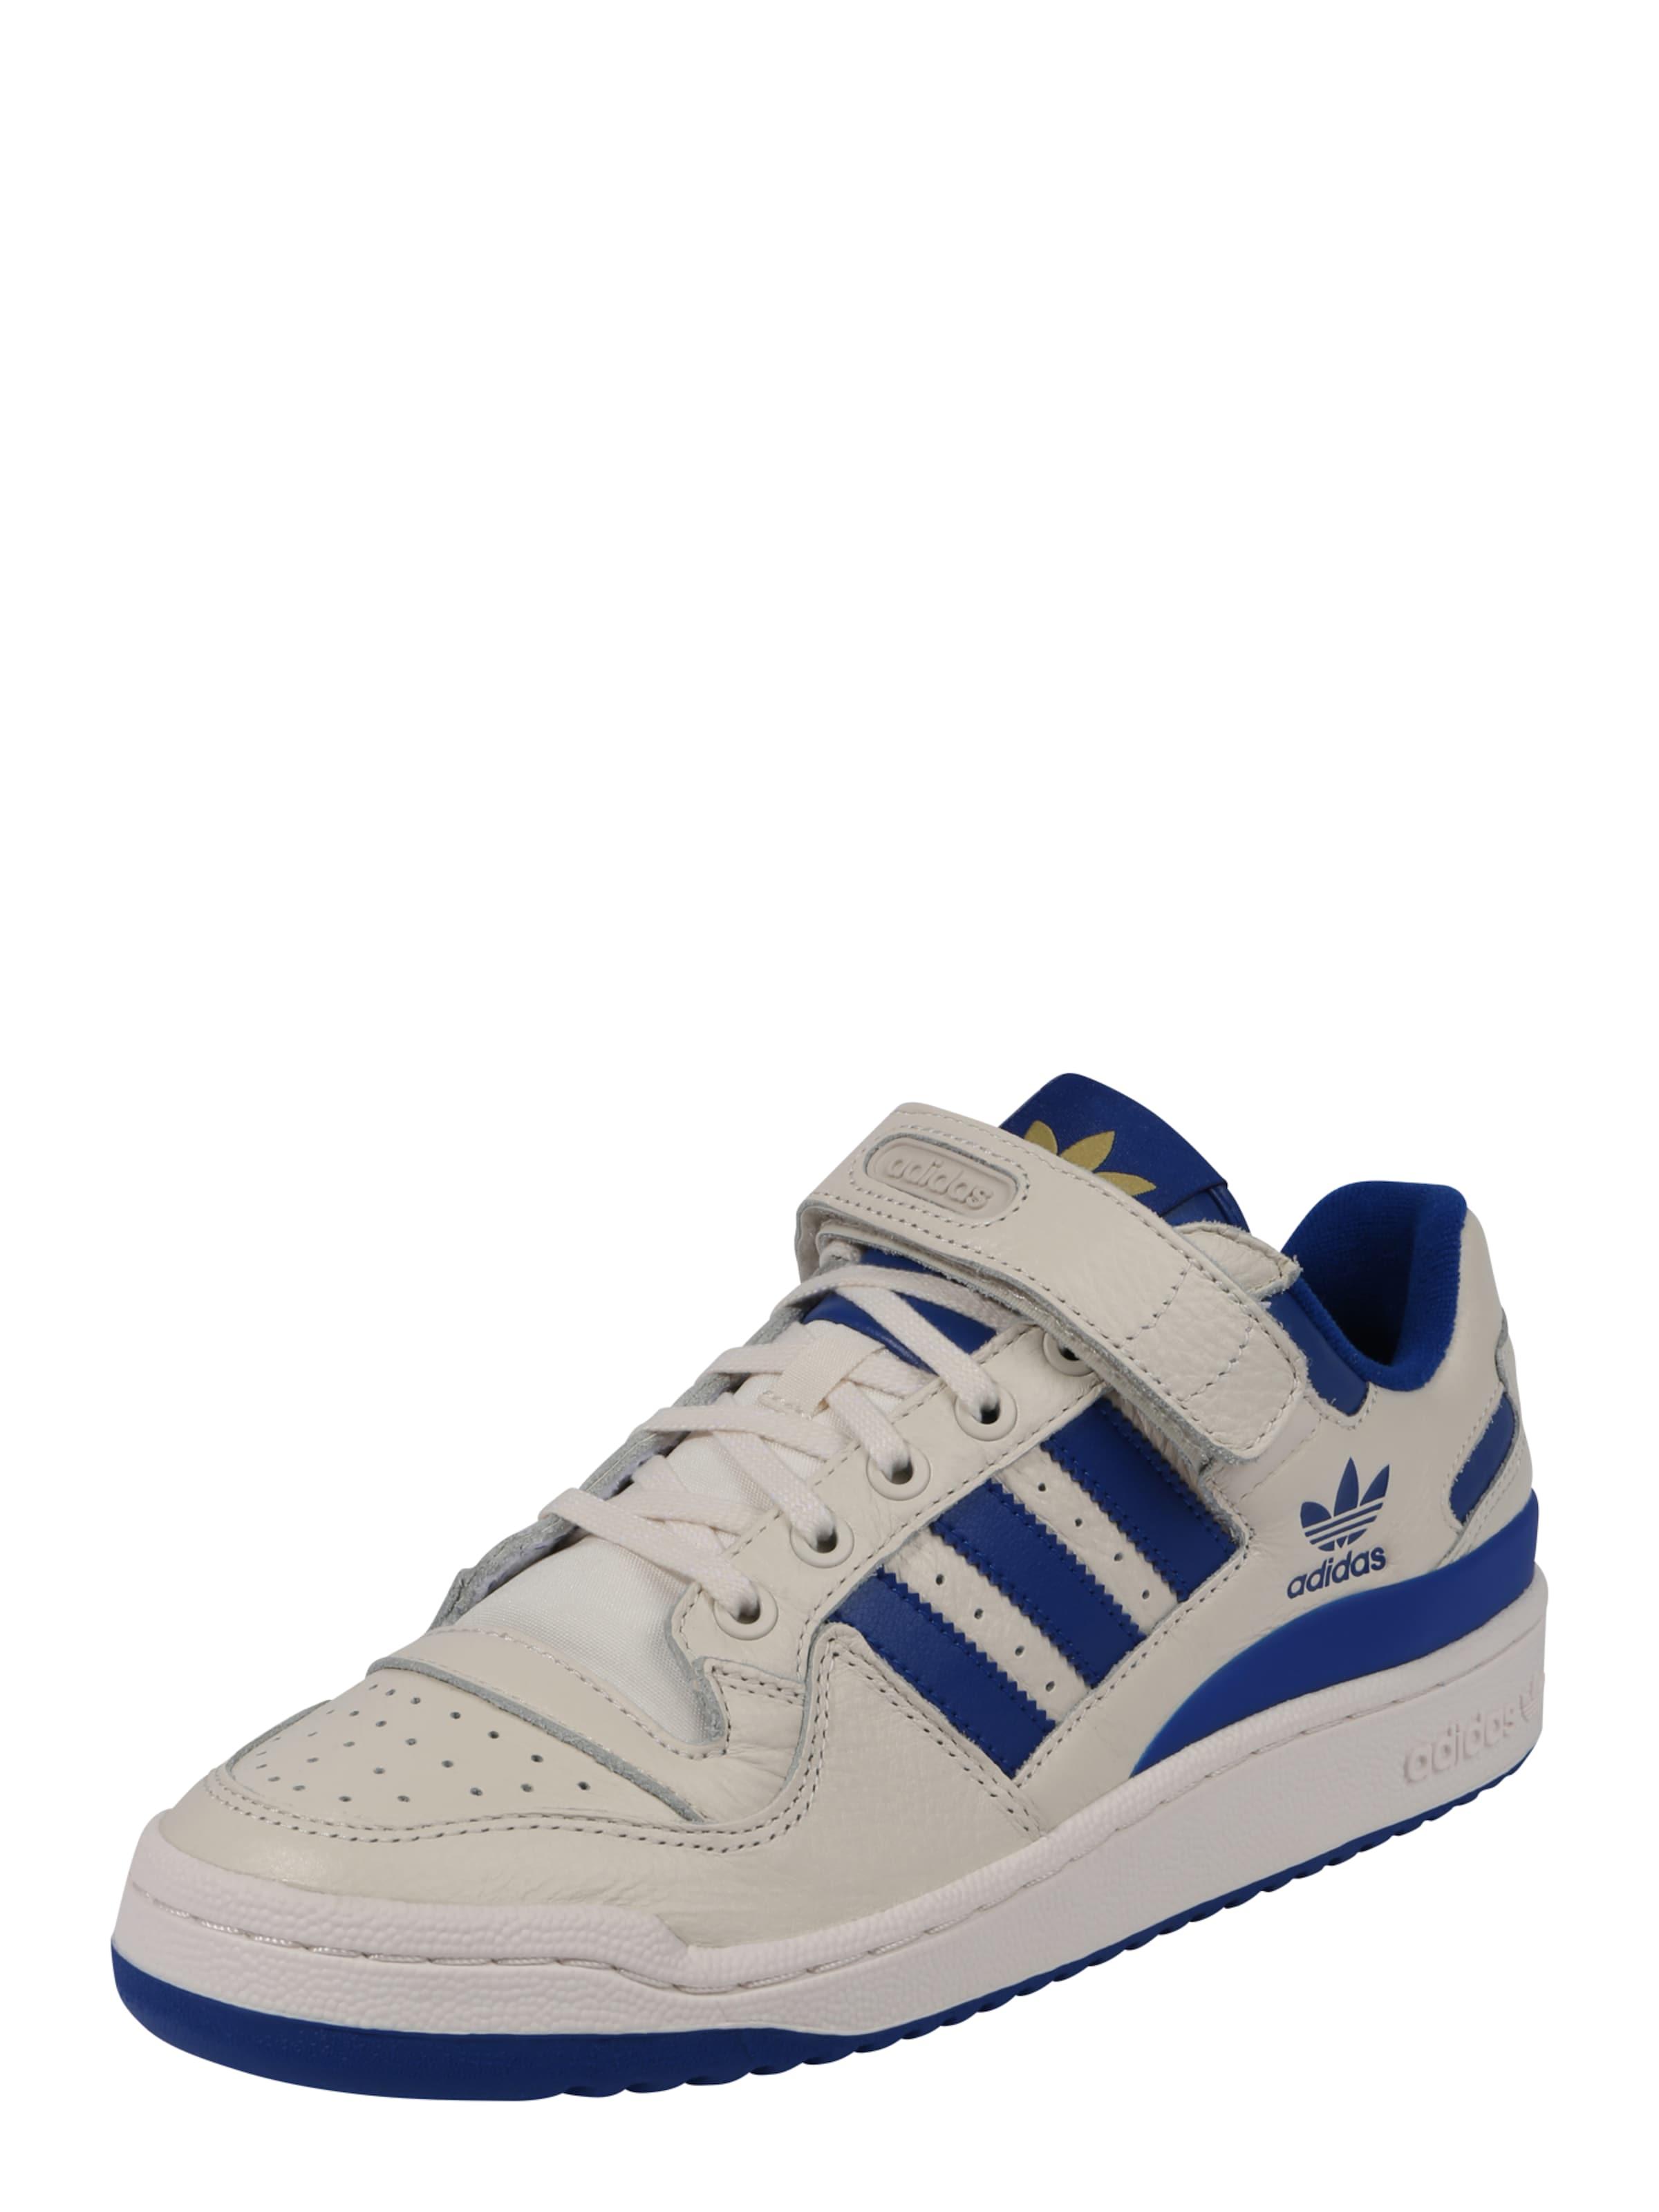 ADIDAS ORIGINALS Sneaker FORUM LO Hohe Qualität